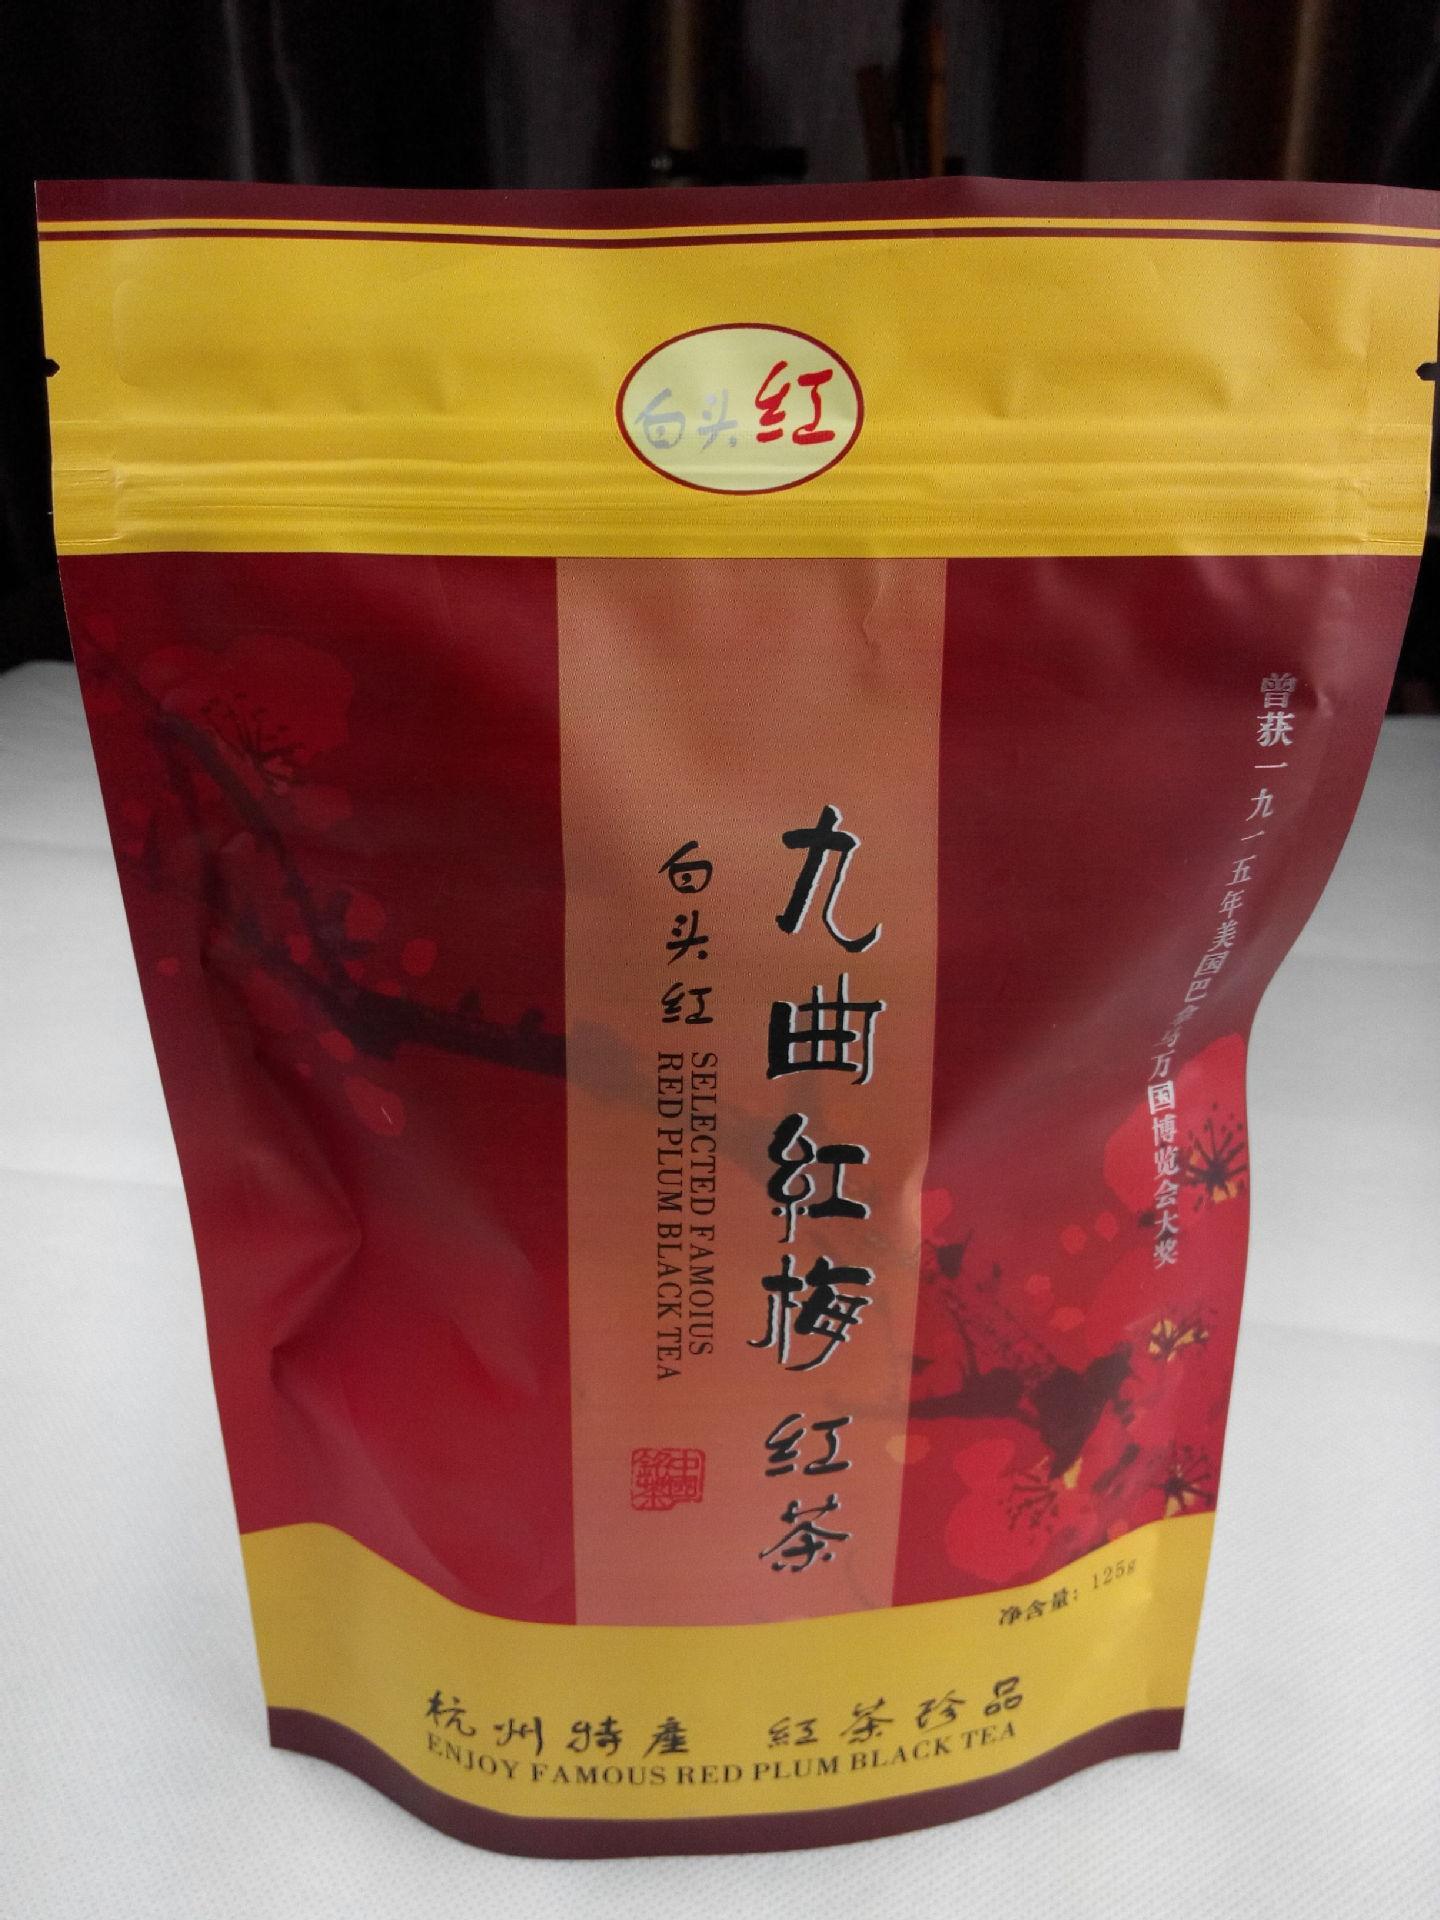 Lapsang Souchong Top Fashion Alpine Stars 1 - 2 Years Vacuum Pack Hangzhou Whitehead 2015 125g Black Tea Jiuquhongmei Red(China (Mainland))